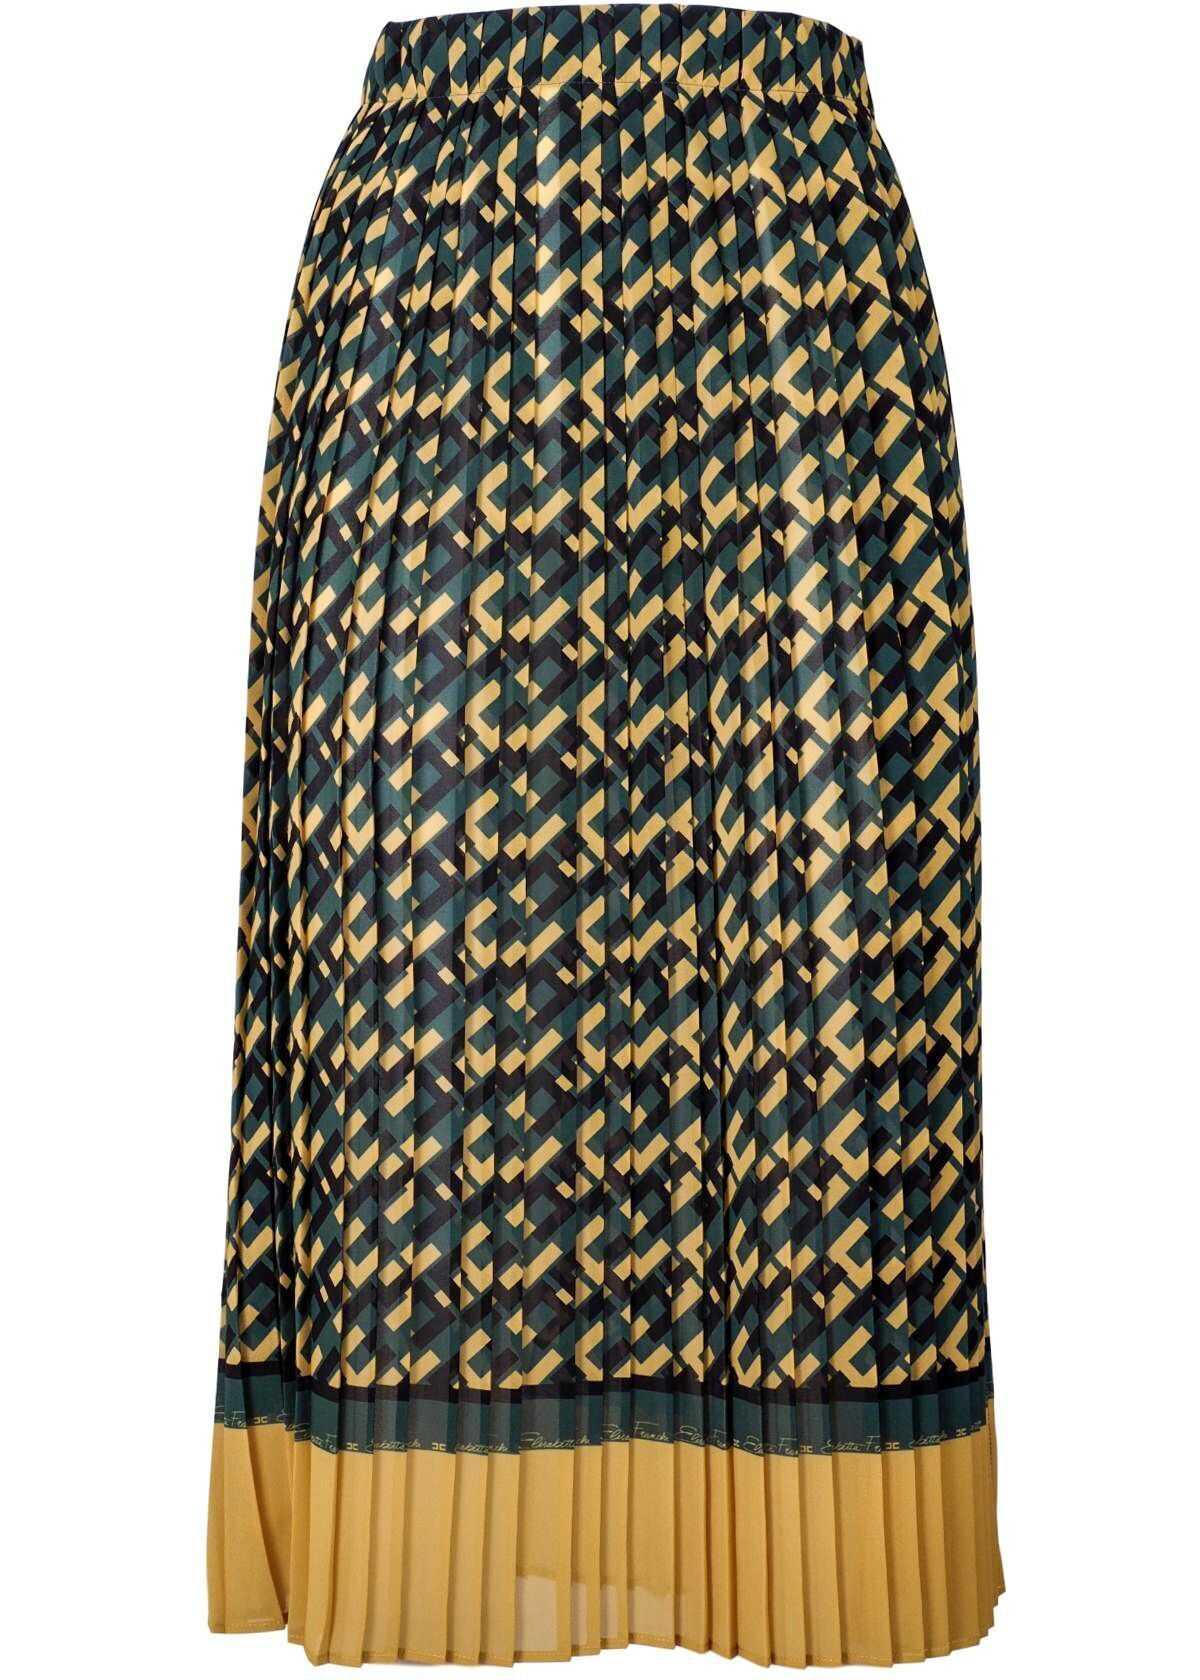 Elisabetta Franchi Polyester Skirt YELLOW